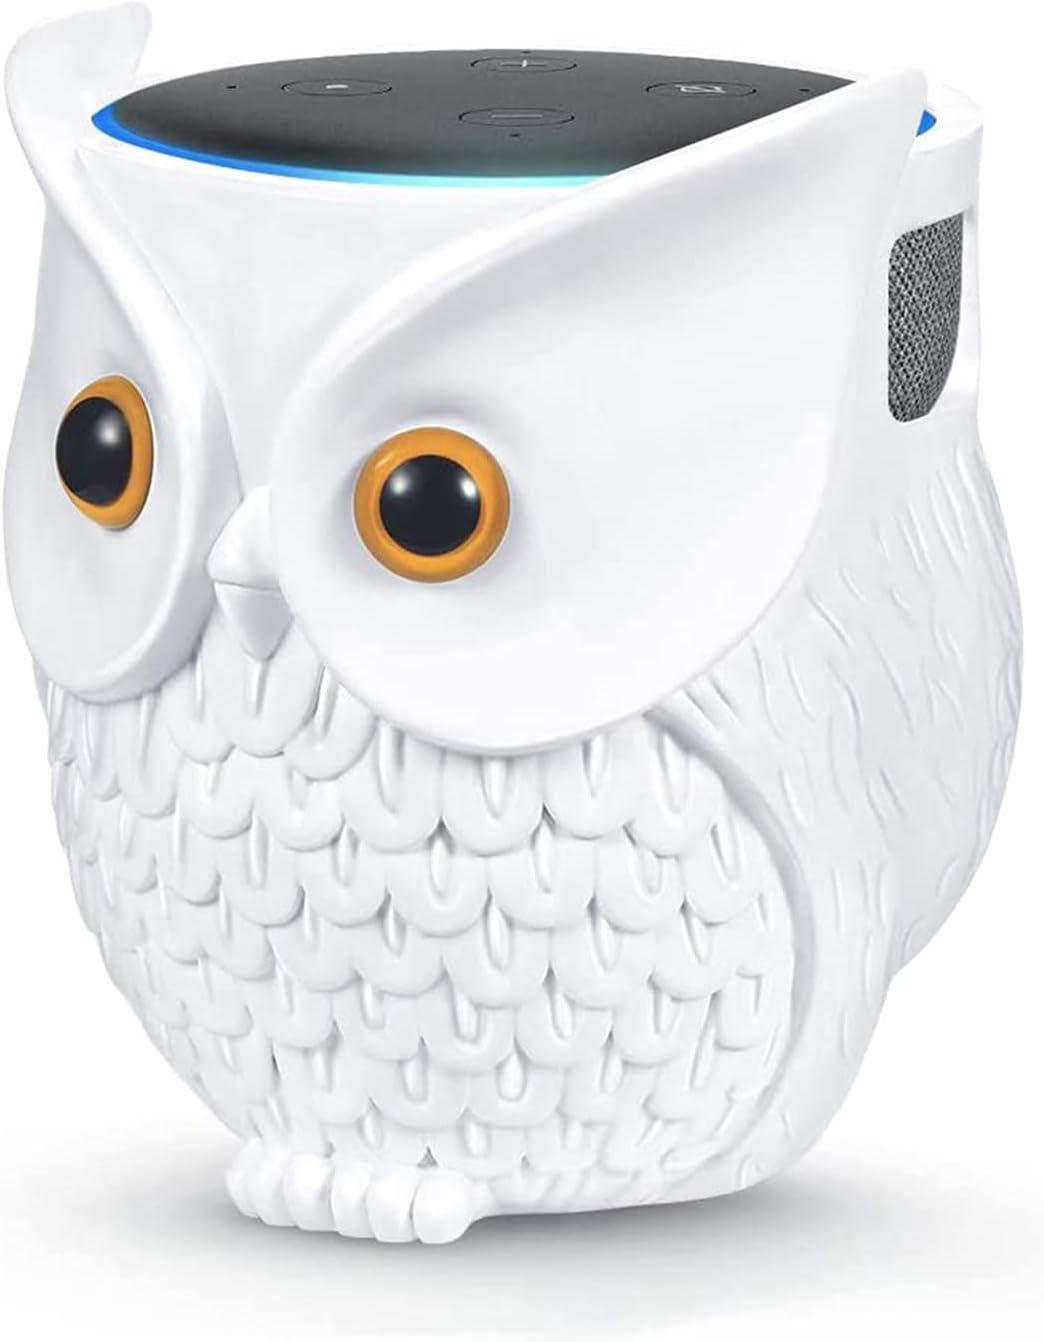 Ctoiotc Owl Holder Stand, Upgraded Owl Statue Smart Speaker Holder Stand for Echo Dot 4th/3rd/2nd and 1st Generation, Google Home Mini/Google Nest Mini (2nd Gen), Home Decor Owl Shape Cartoon Decor